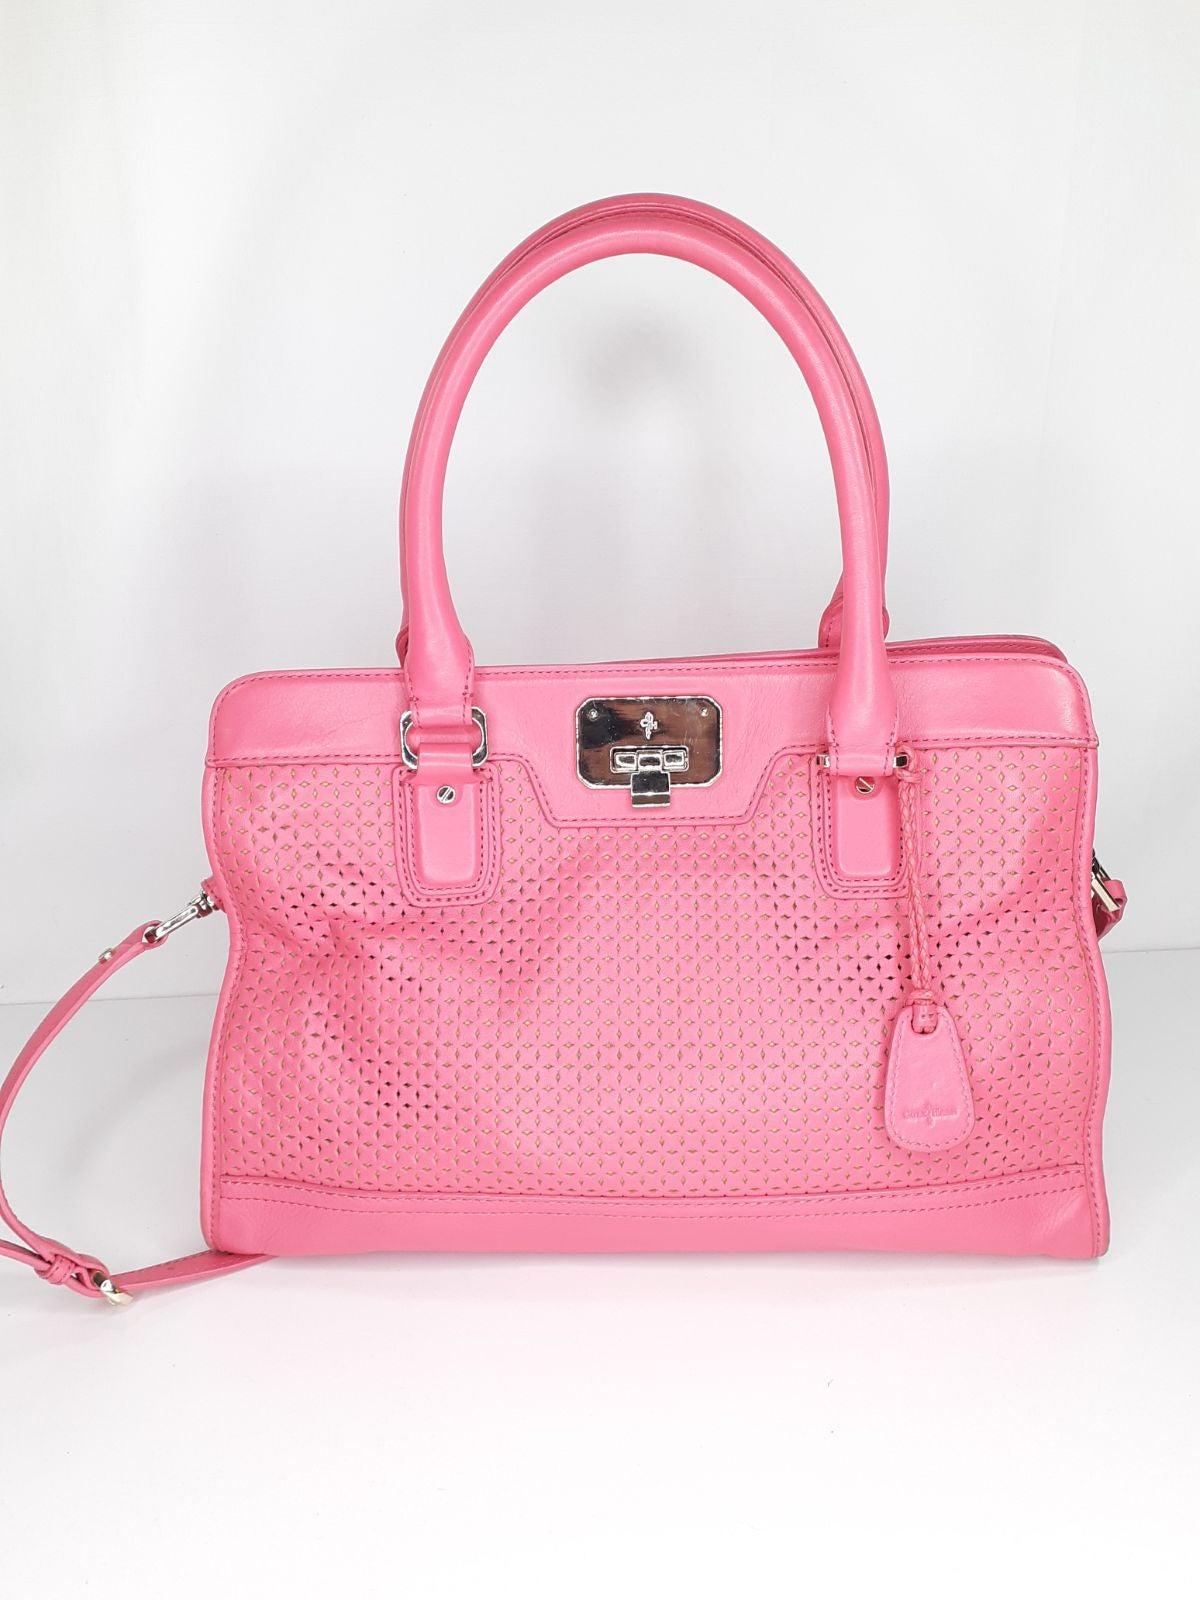 Cole Haan Purse Pink Satchel Bag Handbag